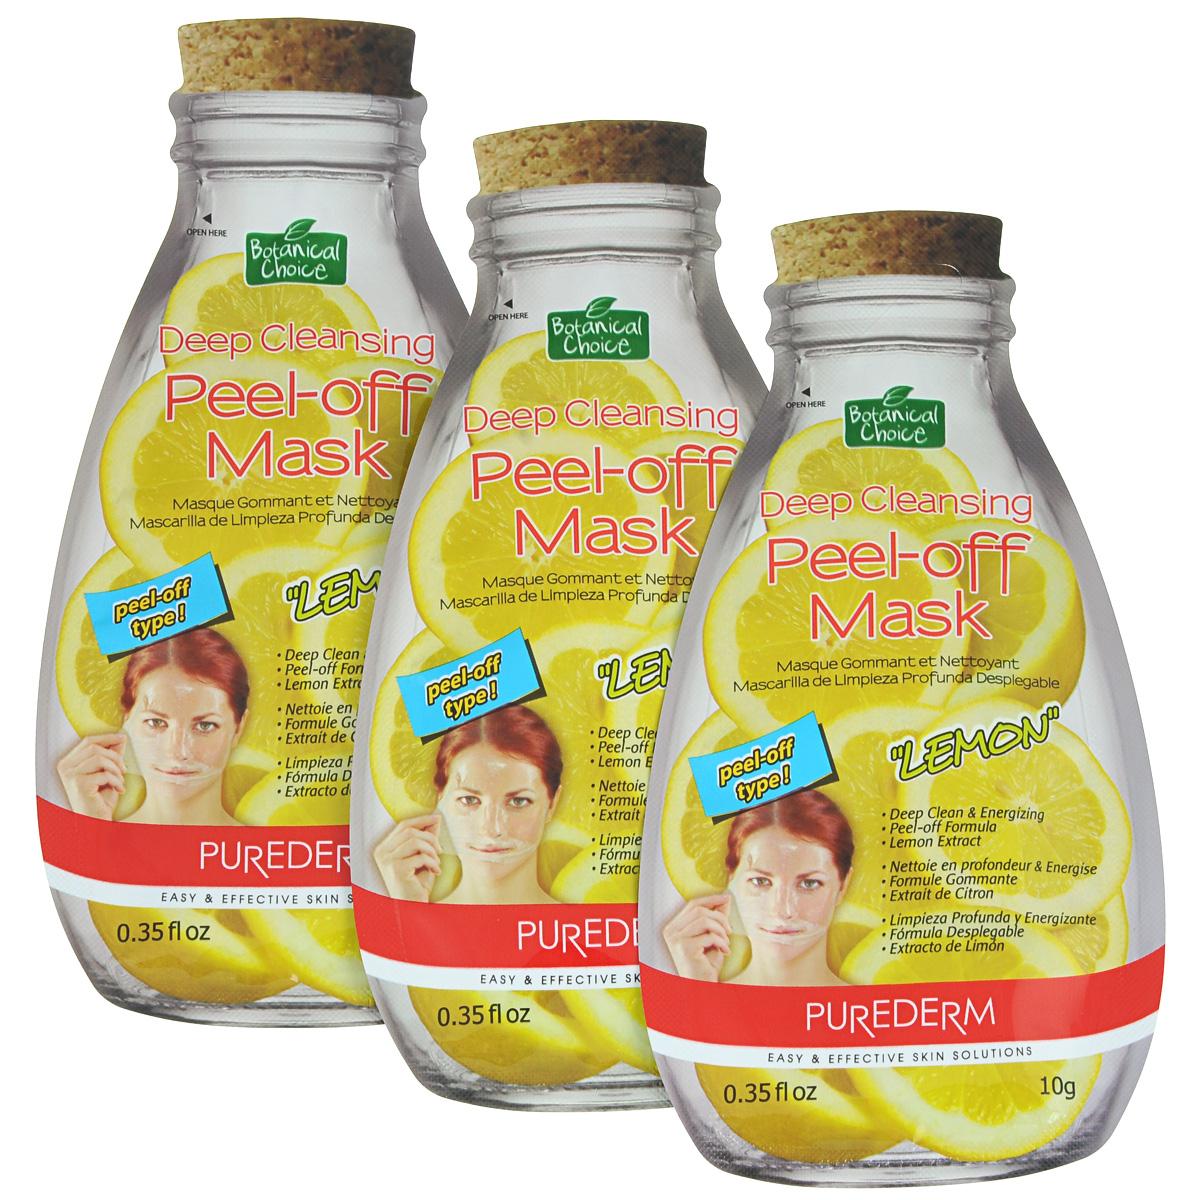 Purederm Глубоко очищающая маска-пилинг для лица Лимон, 3 х 10 г. маска пленка для придания упругости коже лица health